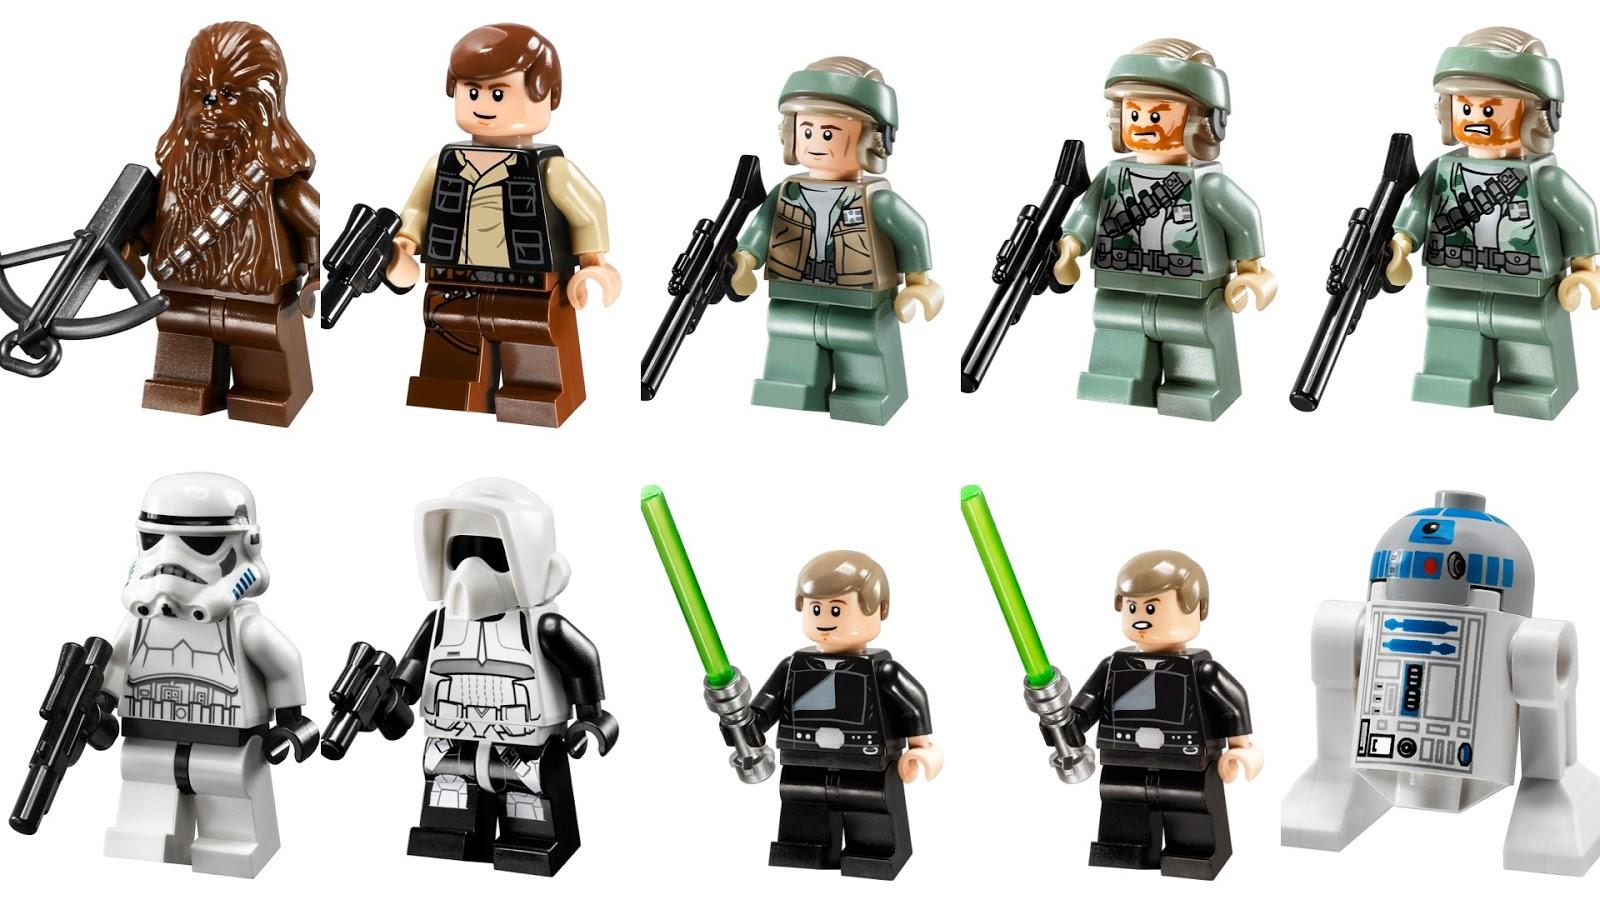 Kleurplaten Lego Star.Lego Star Wars Barbie Rule Black Friday Toy Shopping Says